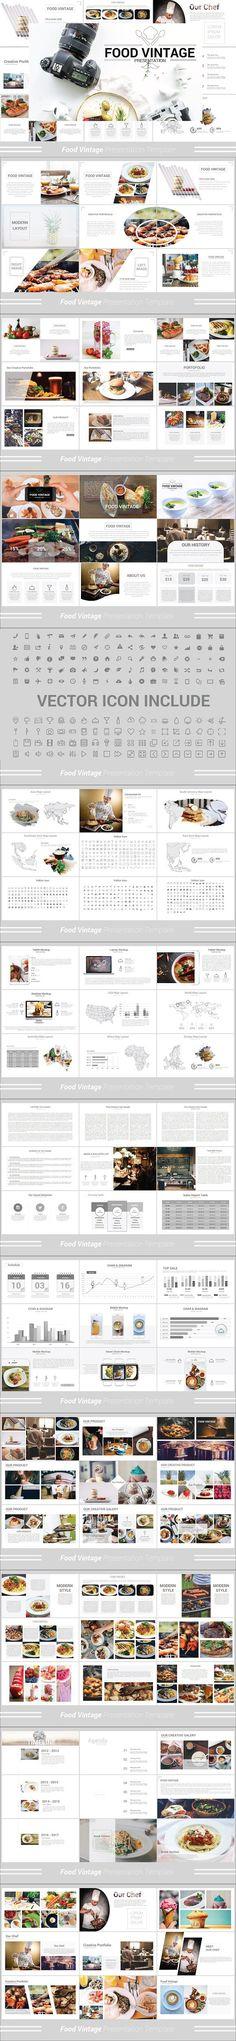 Food Vintage Powerpoint Template. Presentation Templates